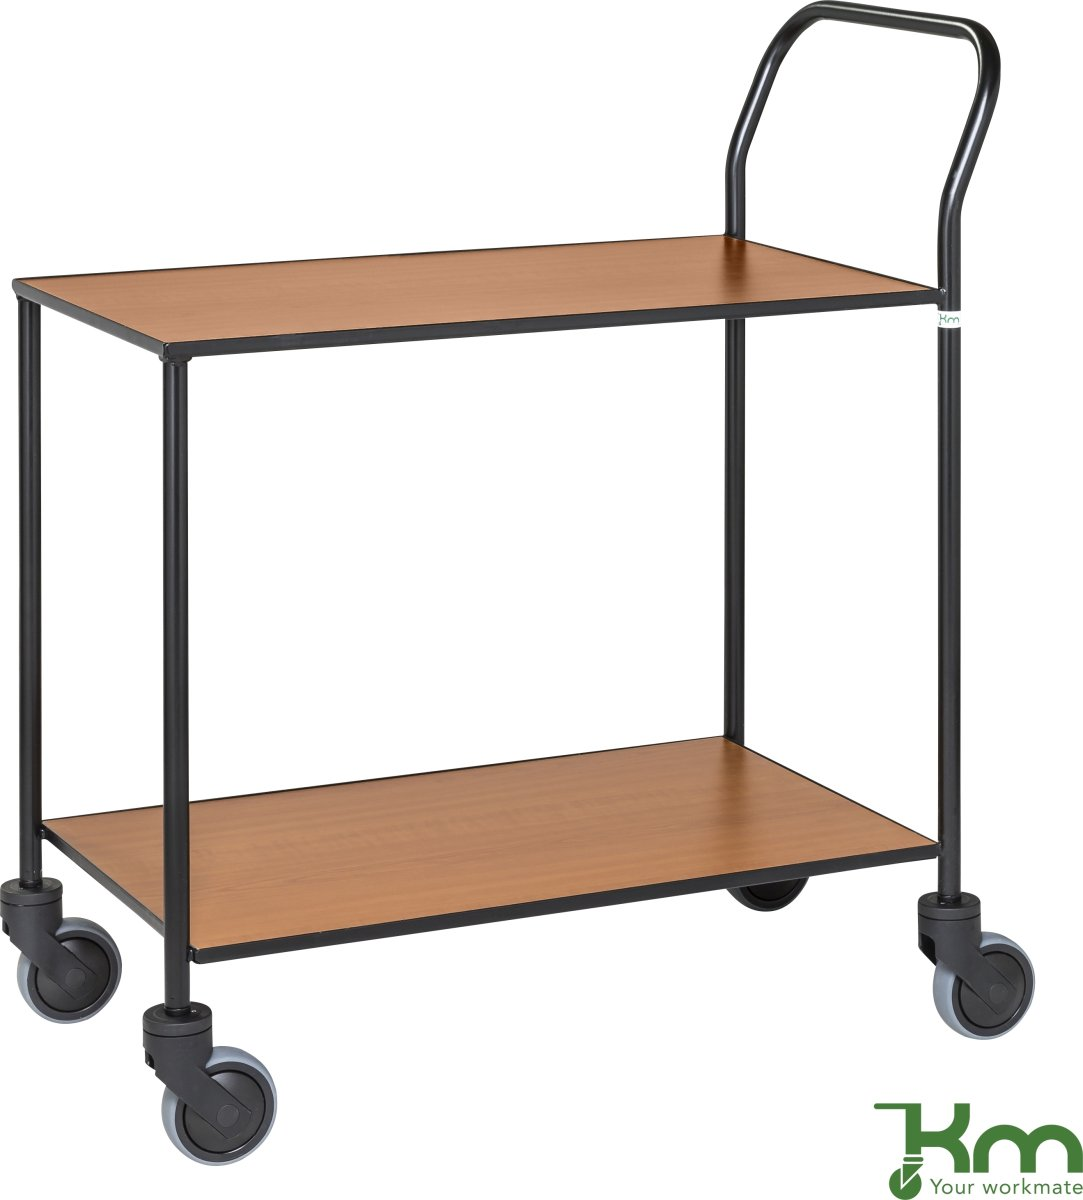 Rullebord - 2 hylder, 840x430x970, Sort/Kirsebær